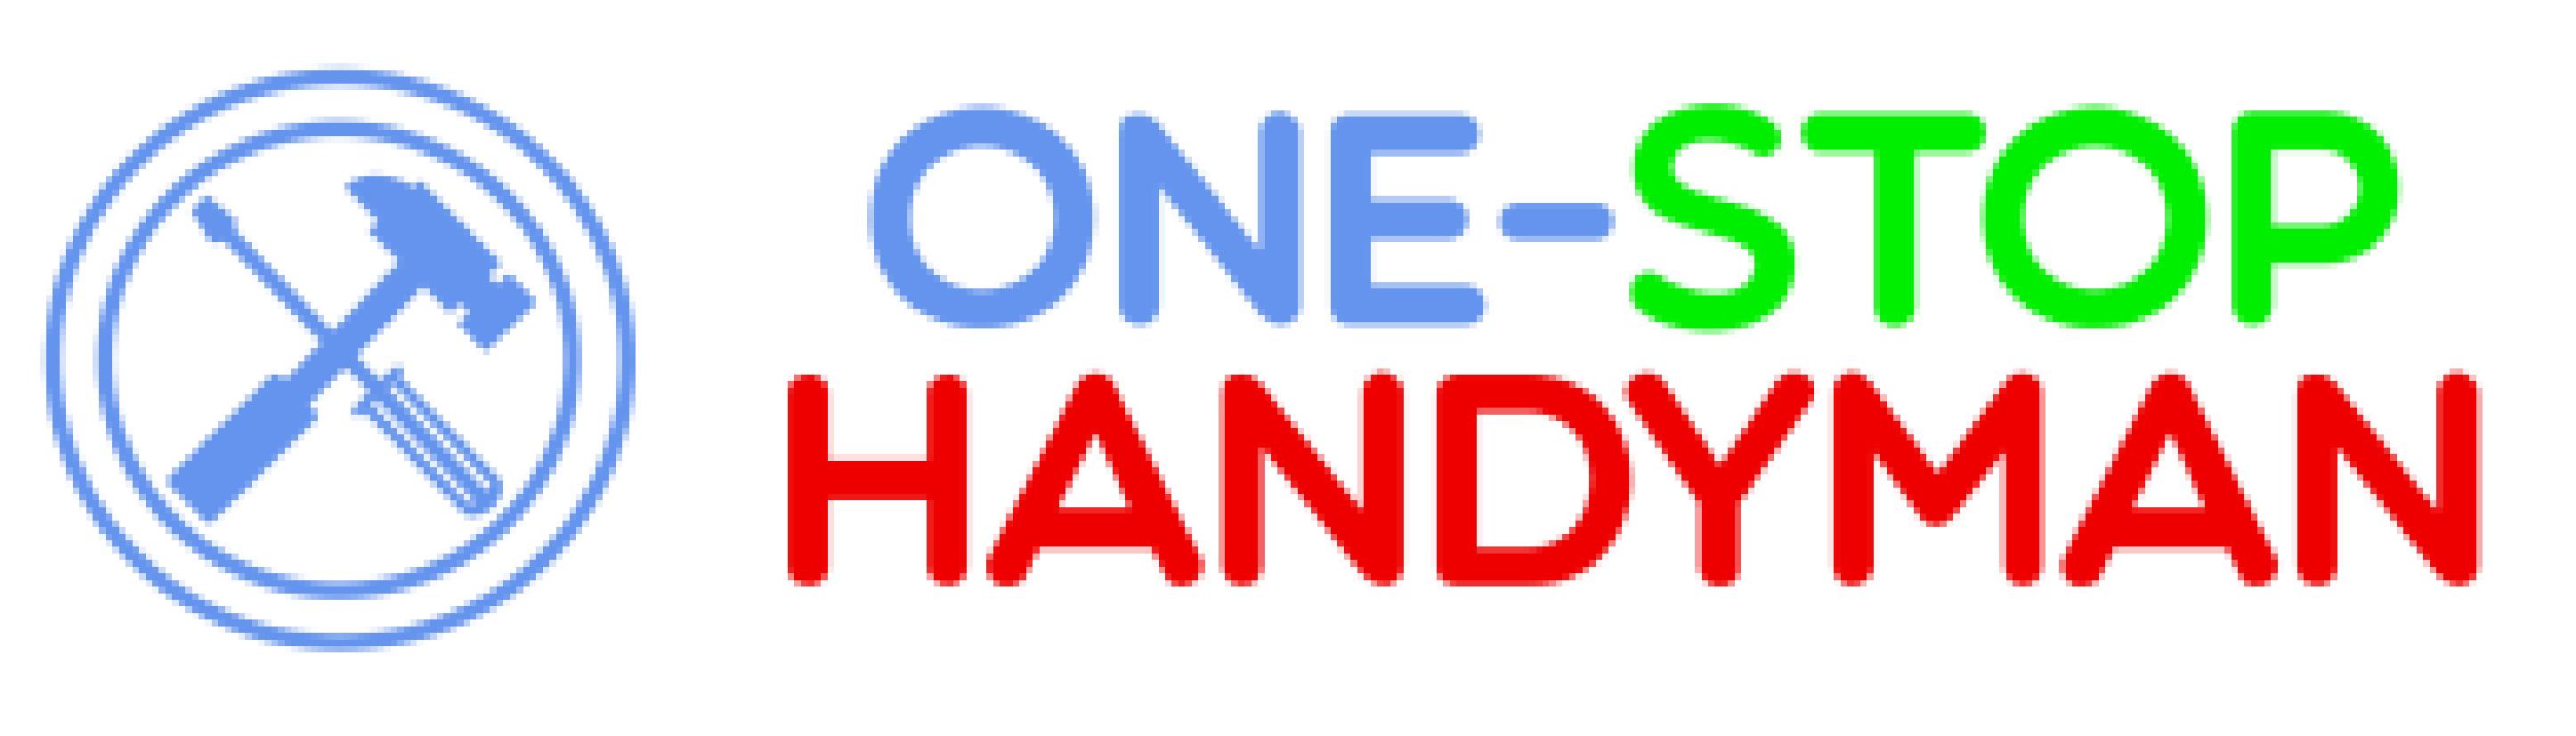 One Stop Handyman